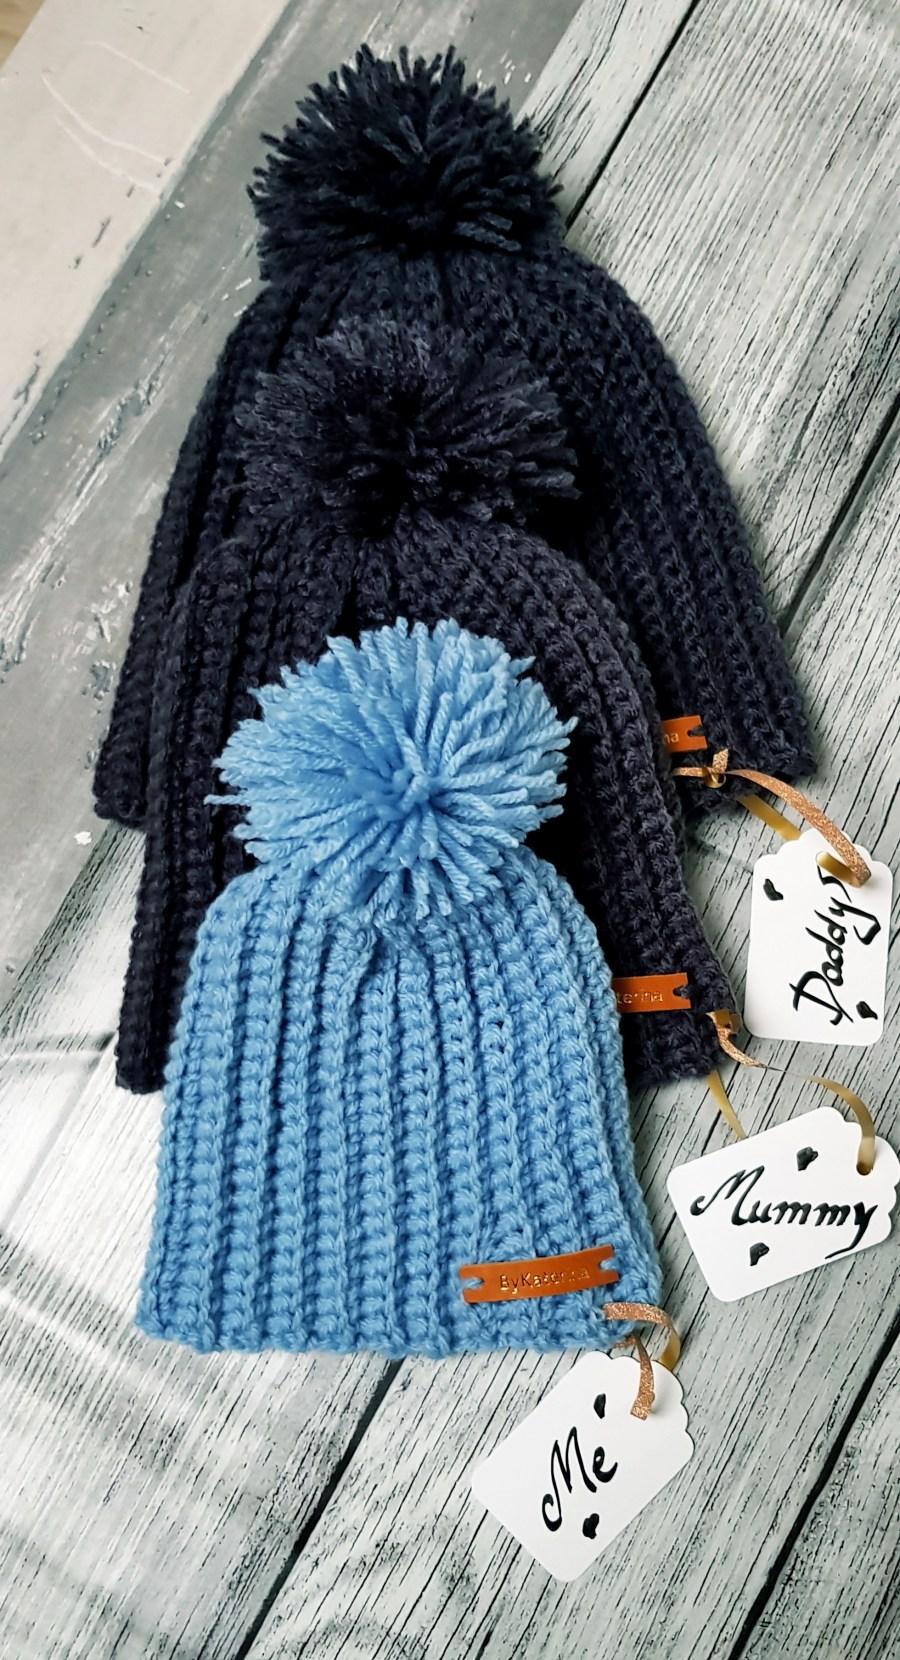 Daddy, Mummy & me Crocheted hats